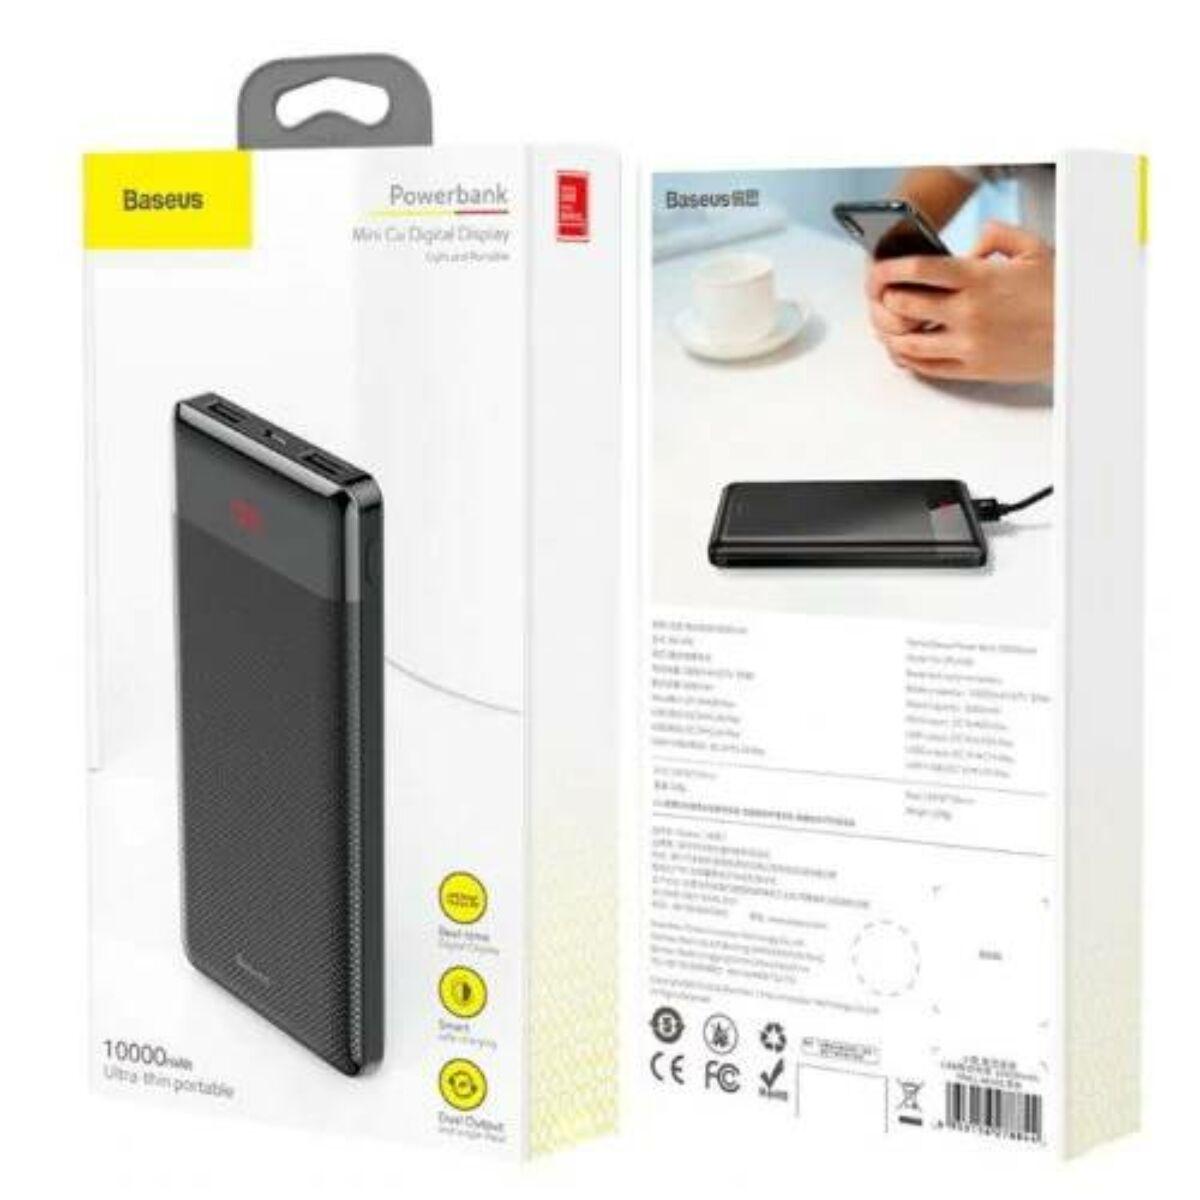 Baseus Power Bank Mini Cu, digitális kijelző (Micro USB bemenet / dupla USB kimenet), 2.1A, 10.000 mAh, fekete (PPALL-AKU01)